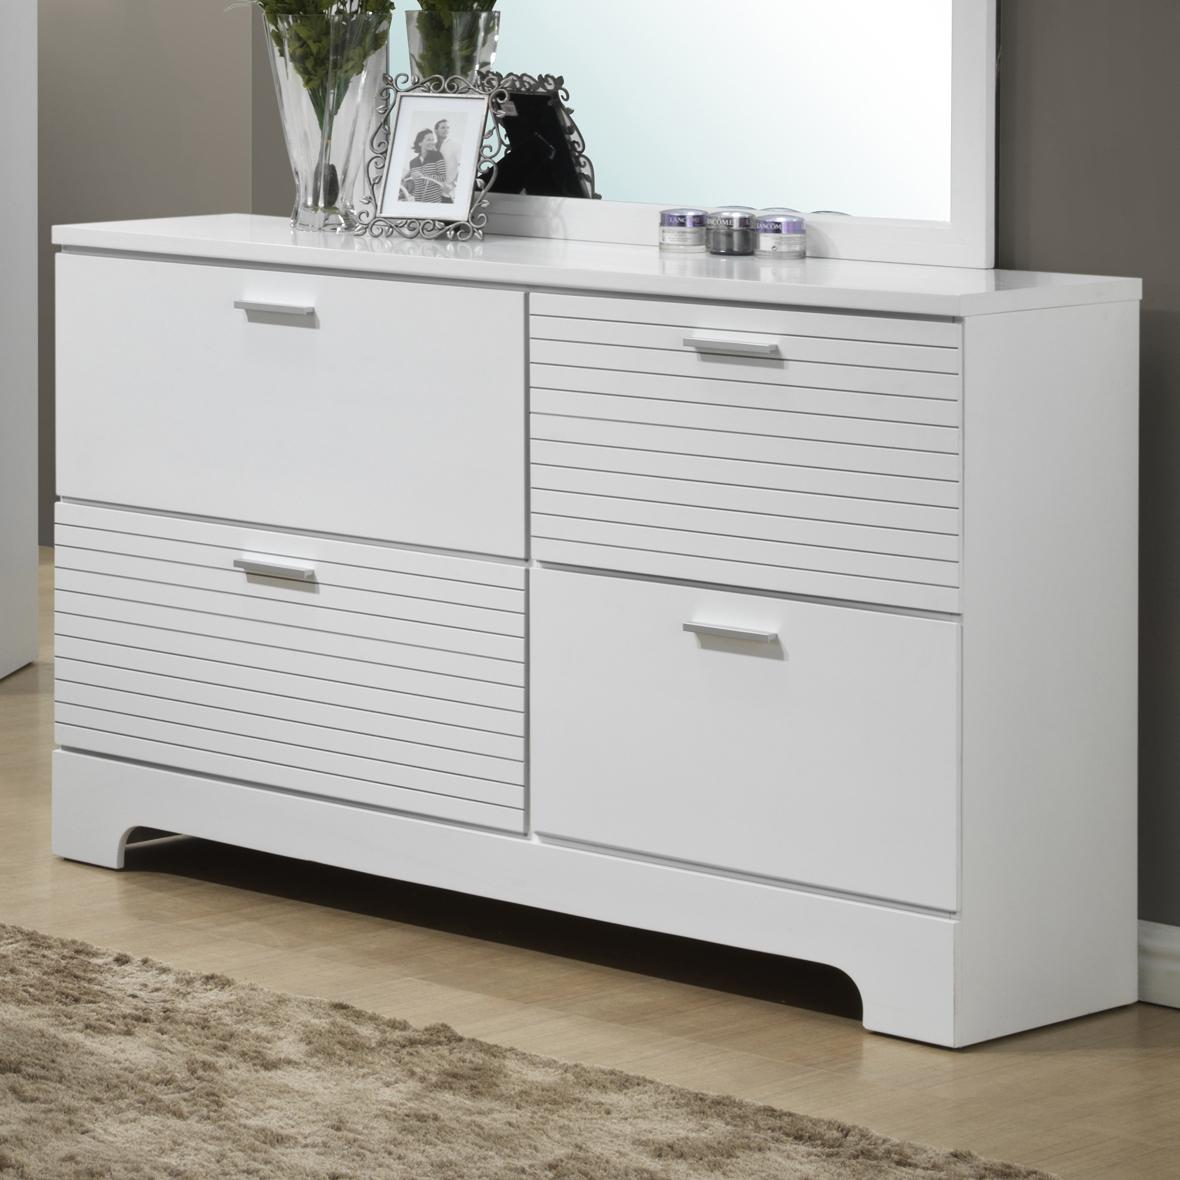 Lifestyle Sami Dresser - Item Number: C3333A-045-4DXX